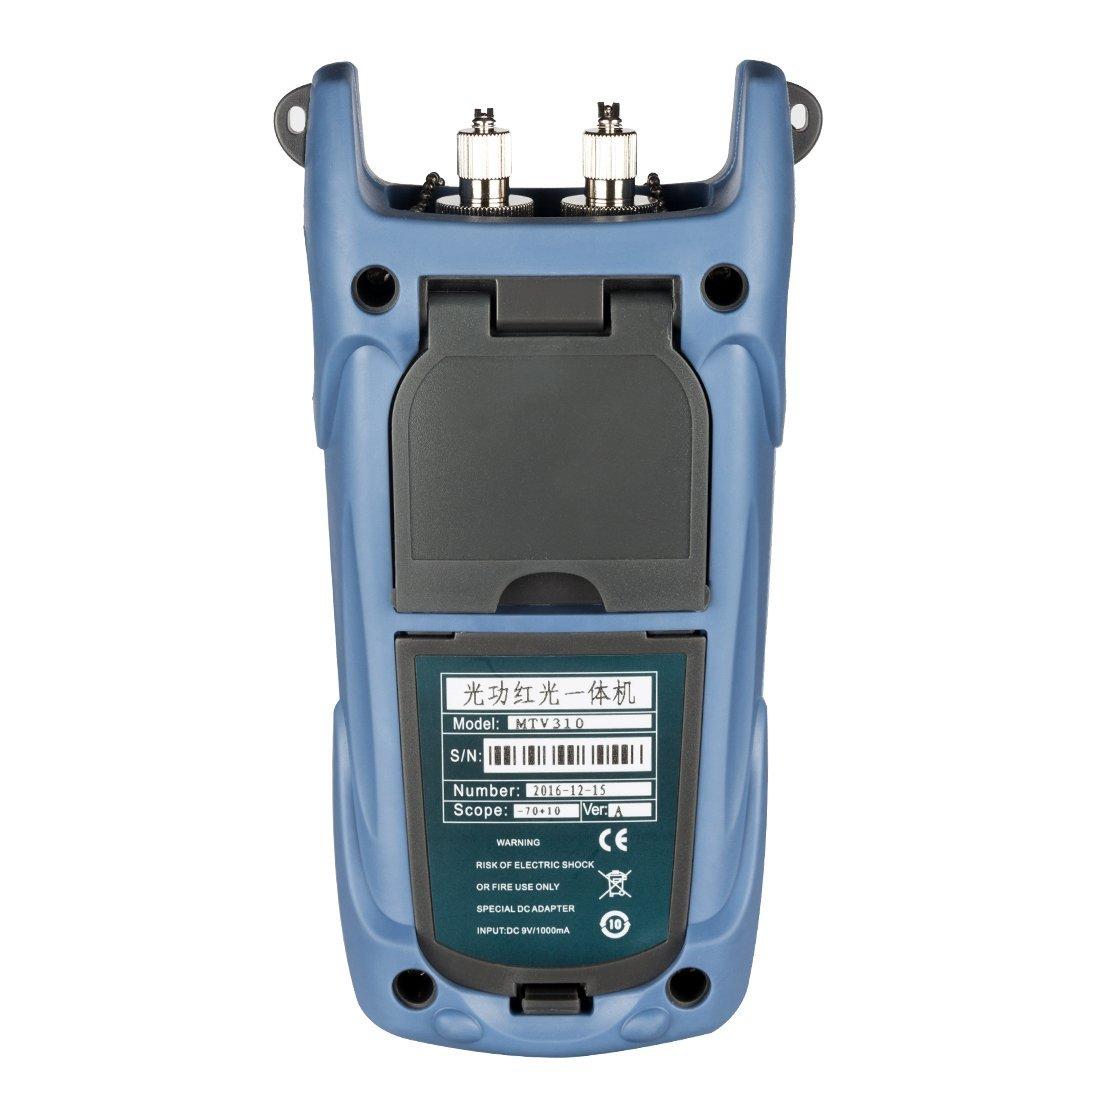 DealMux 5km DC 9V/1000mA -70 ~ +10 dBm Portable Optical Multi-Meter SC/FC/ ST Interfaces Fiber MTV310 for CATV Test CCTV Test and Telecommunication by DealMux